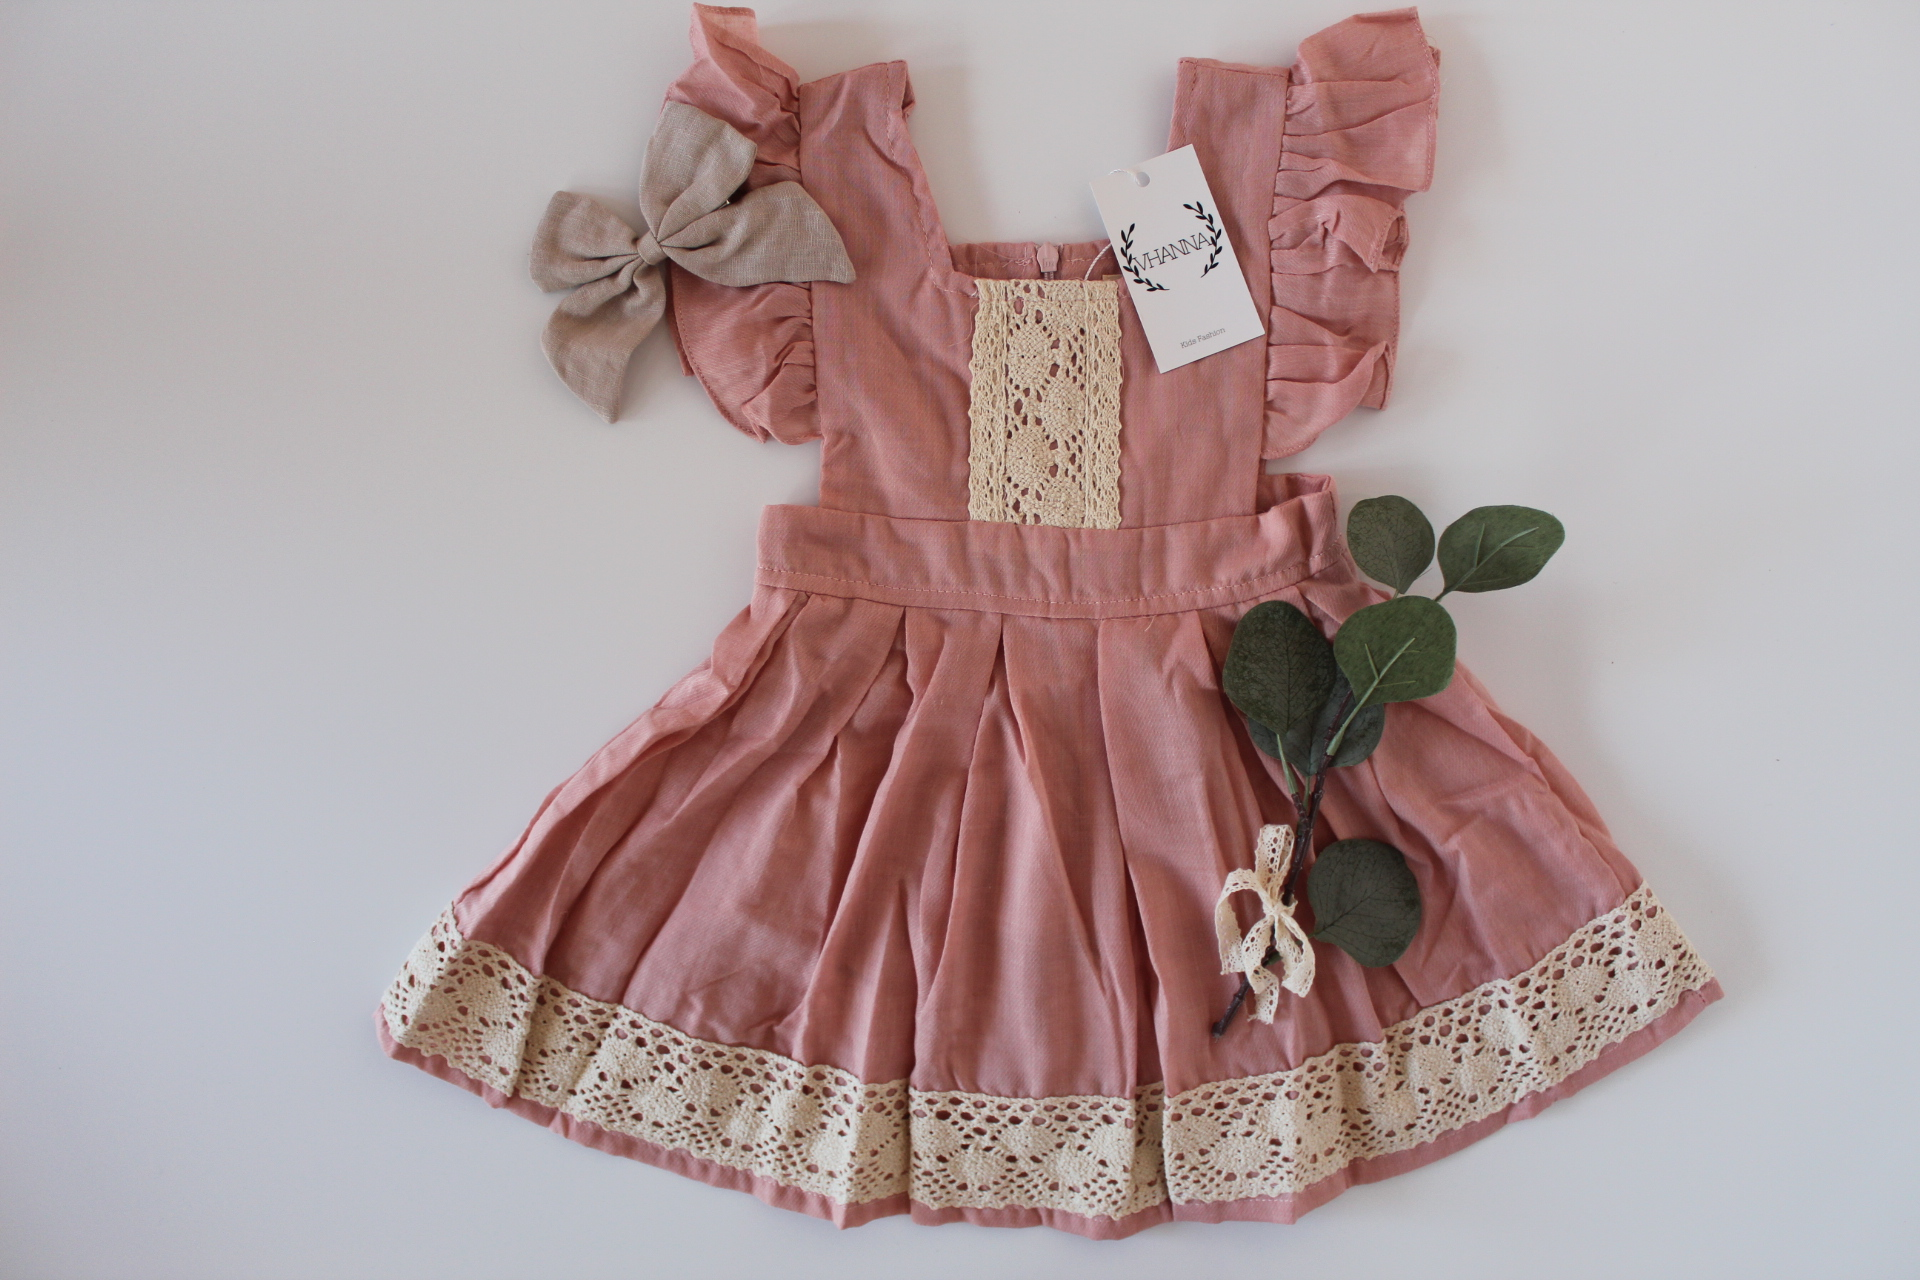 dd4929dd3eb5 Jasmine Dress - VHANNA Kids Clothing Store